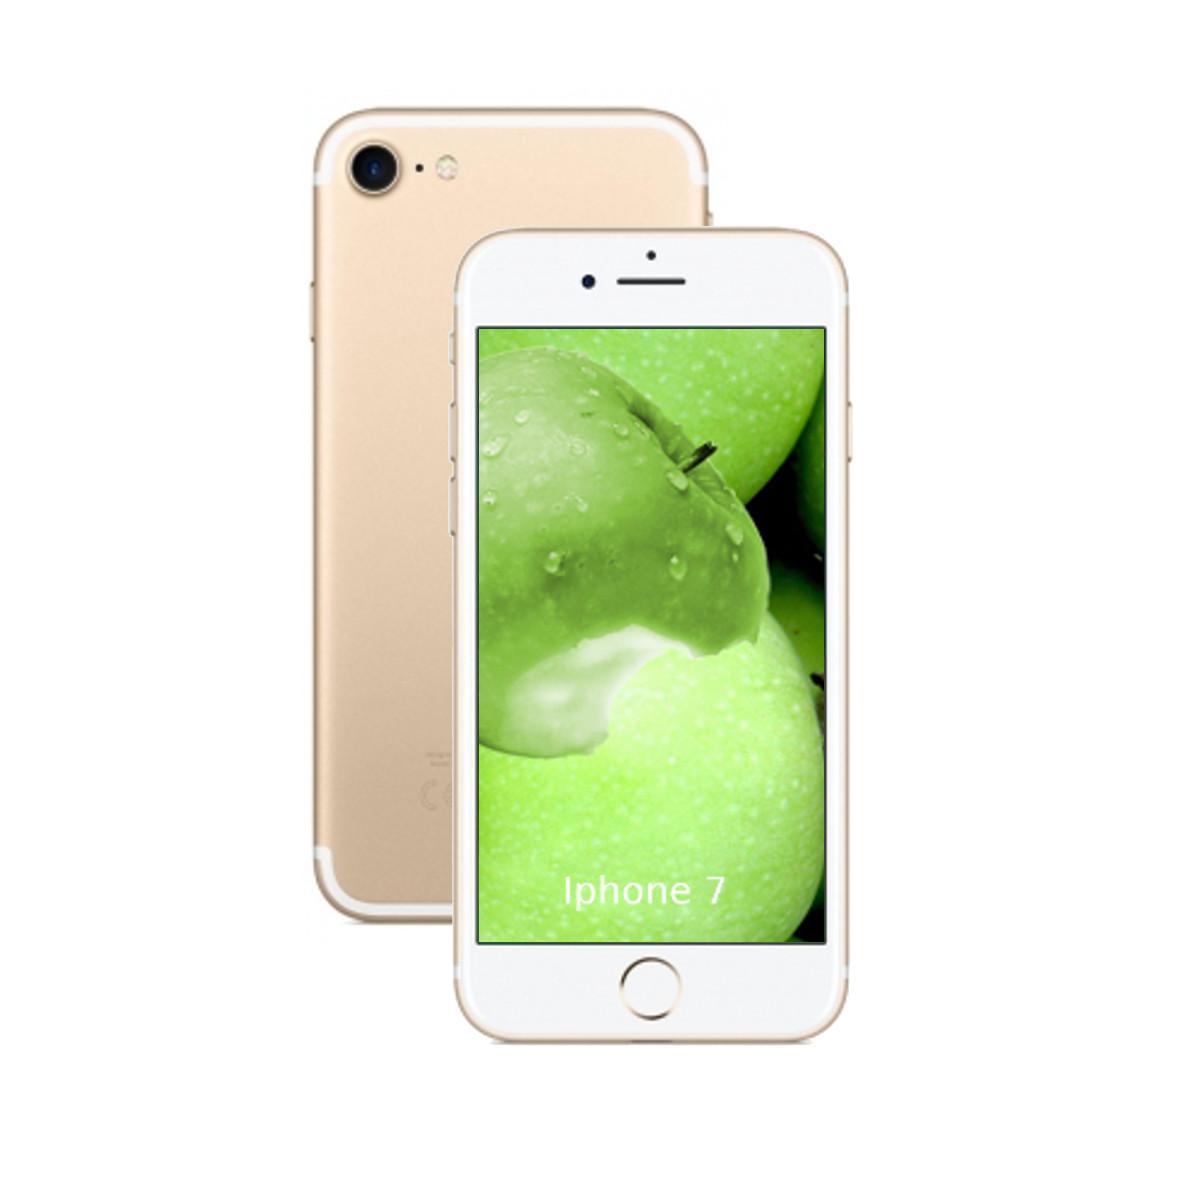 Iphone Apple 7 256 Go Or Pixmania